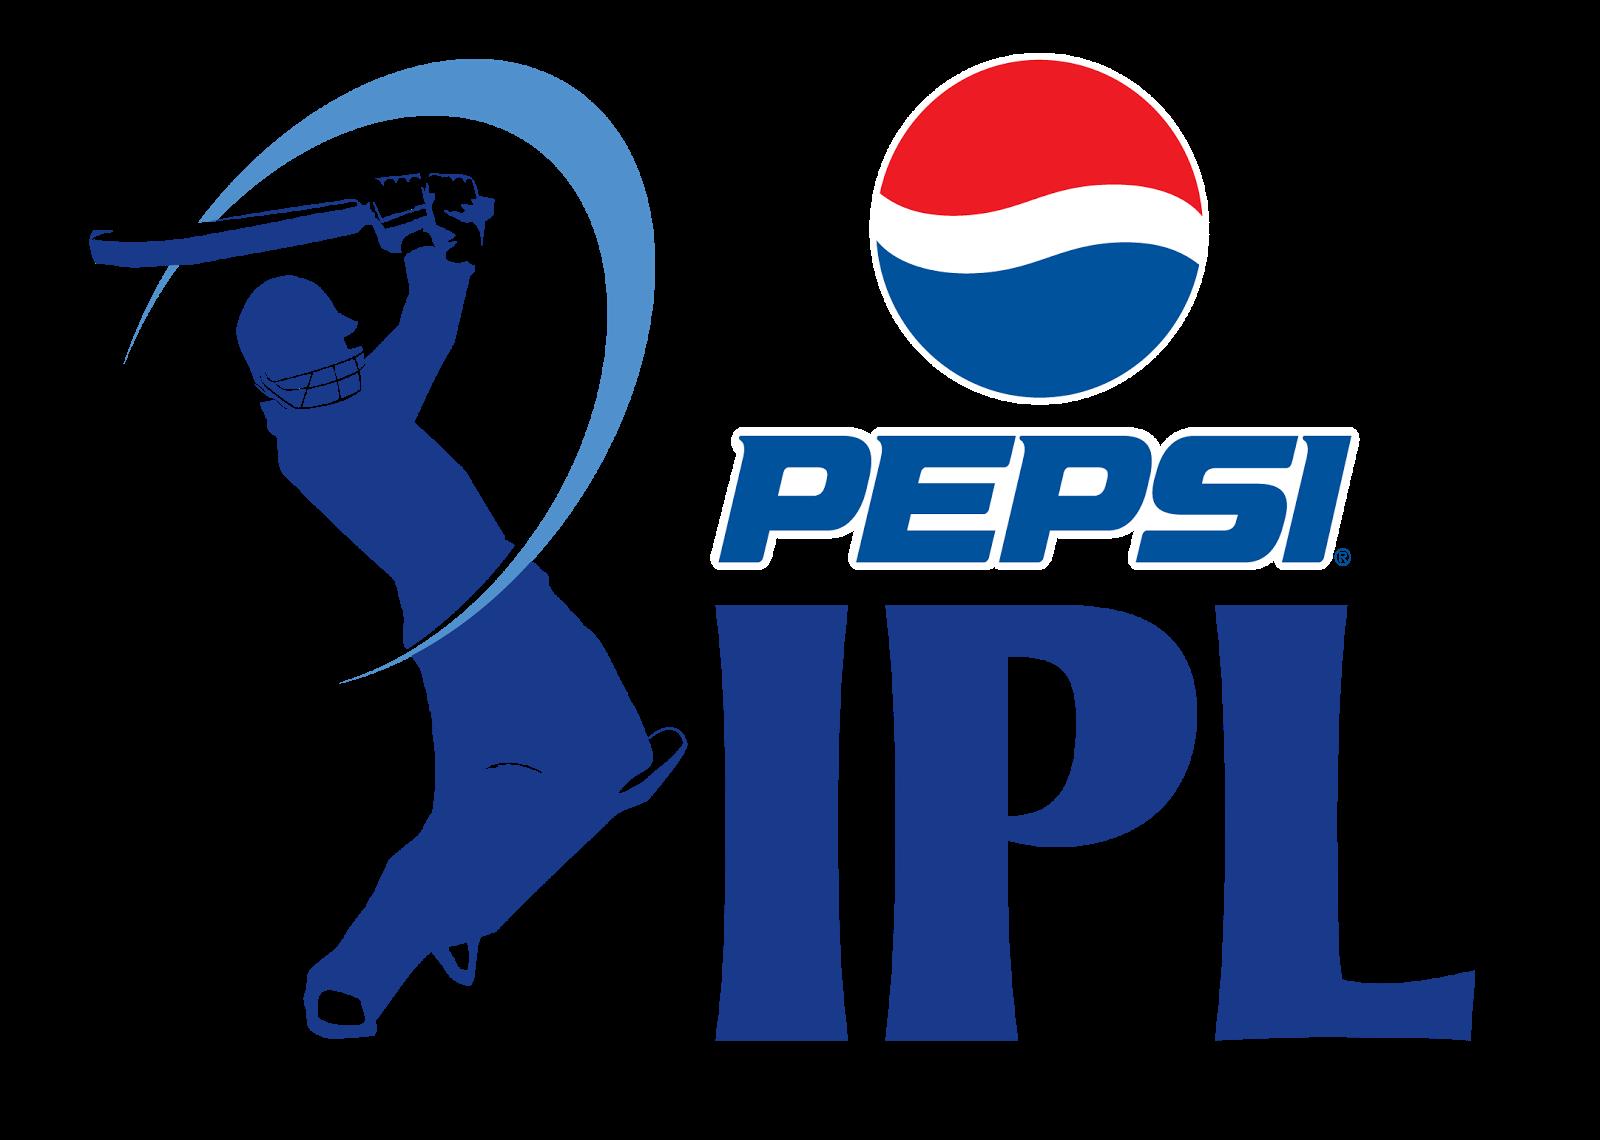 IPL 8 Live Streaming, IPL 2015 Live Streaming | IPL opening.